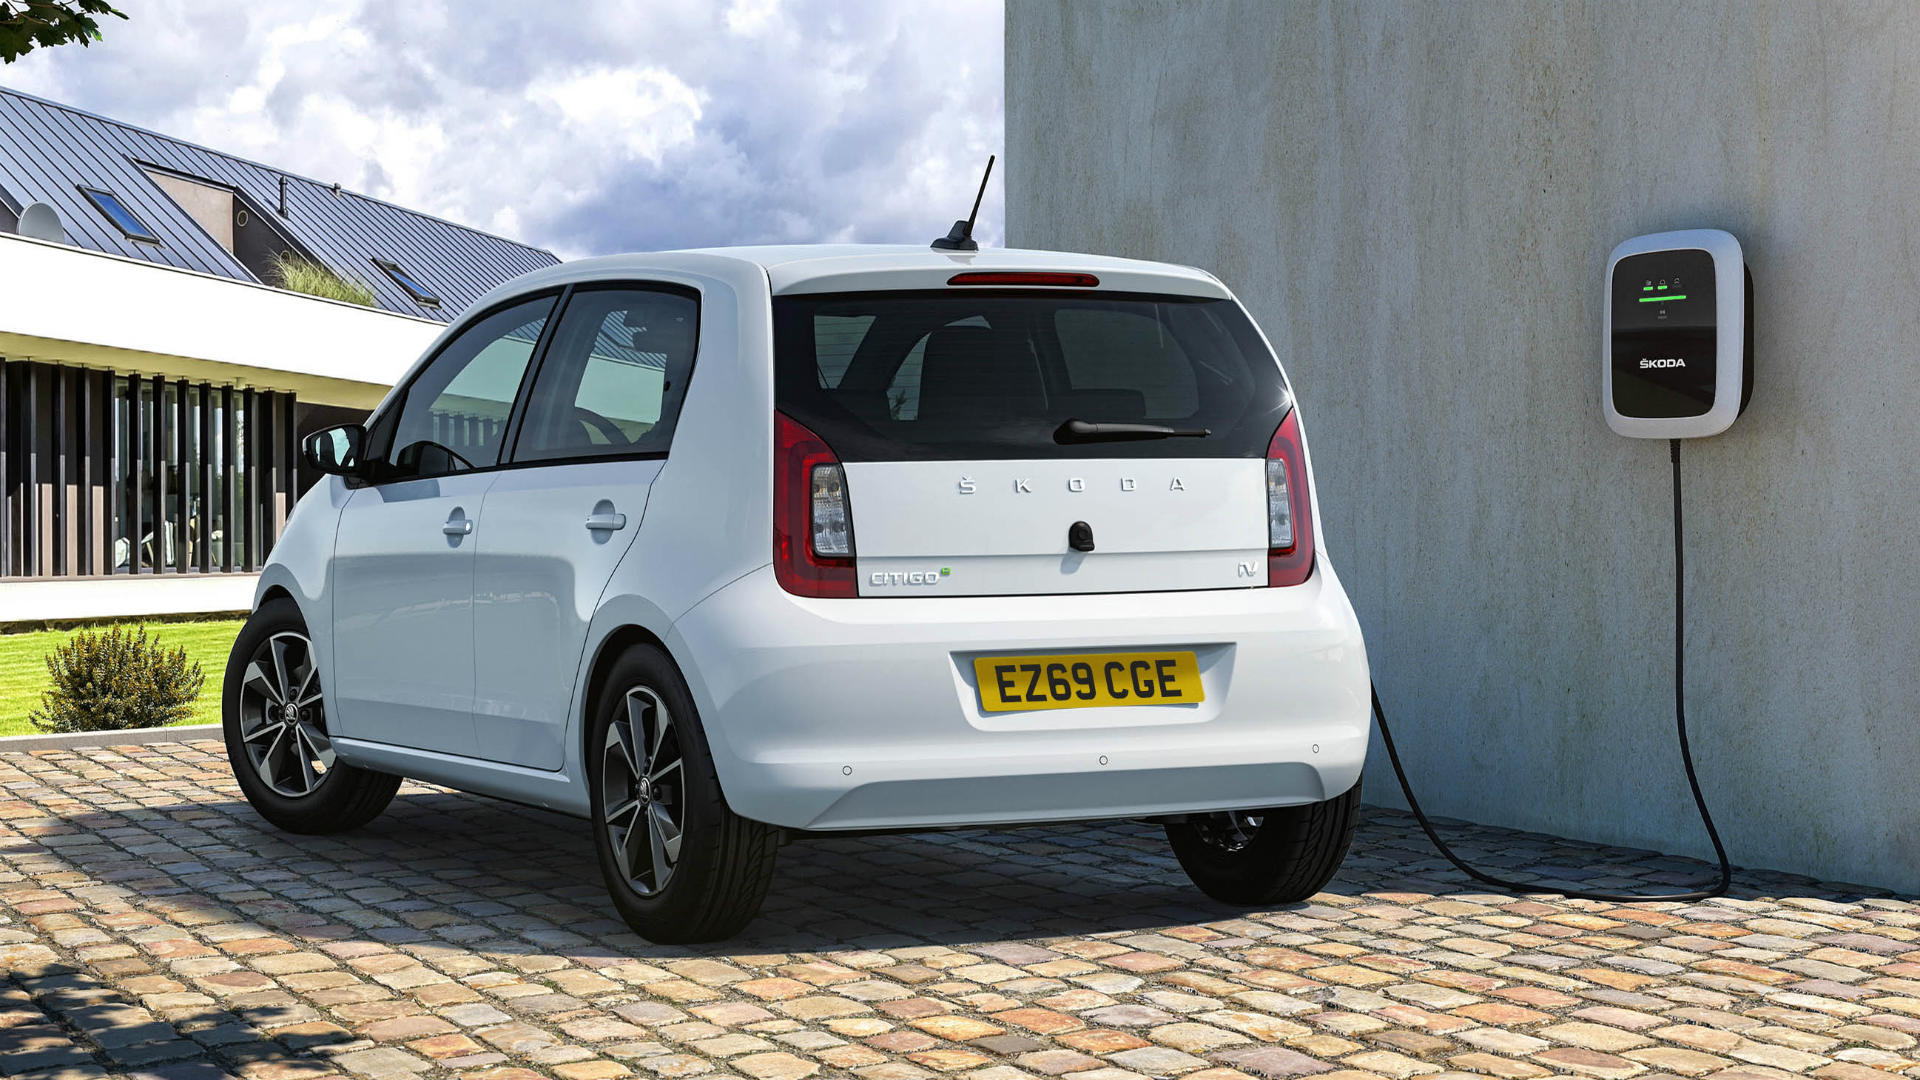 Skoda Citigo electric car prices